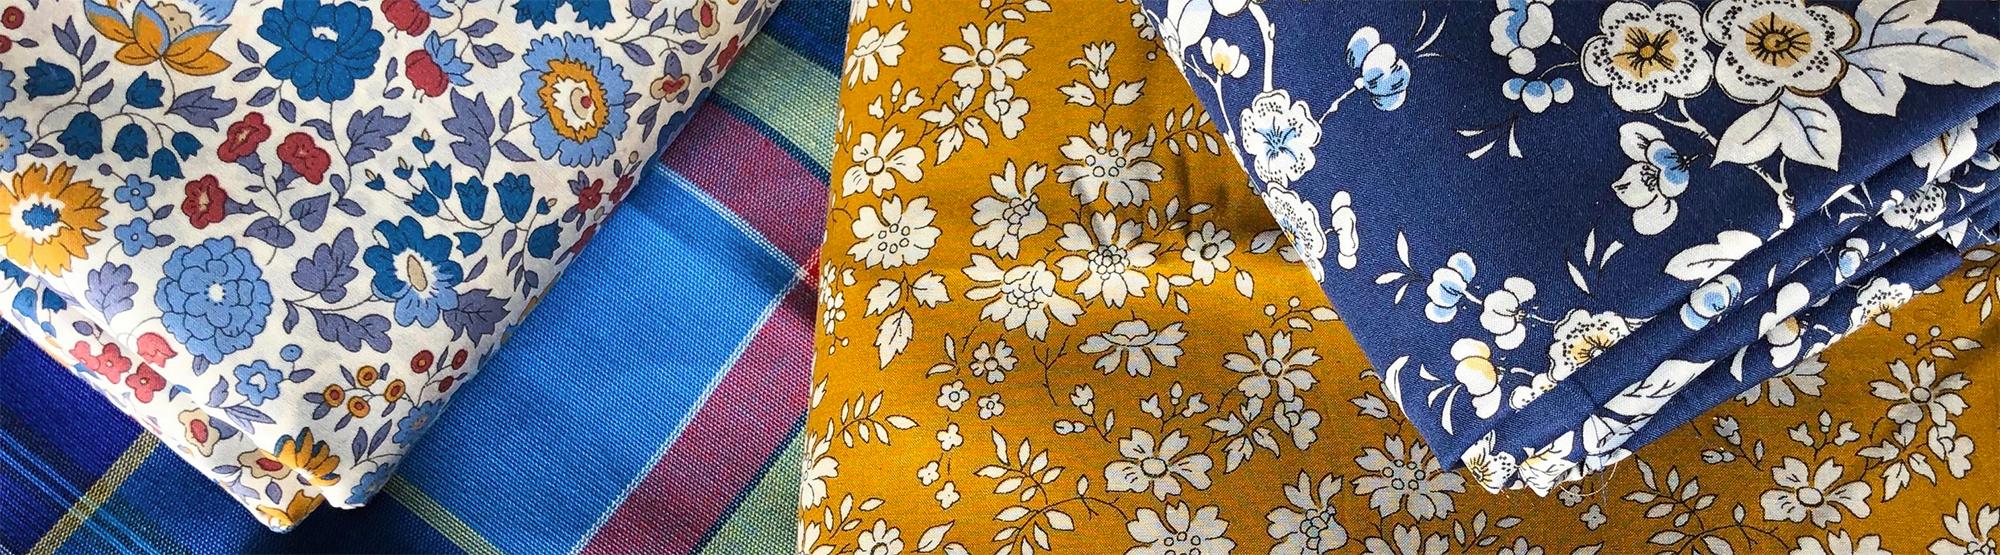 Liberty and Madras Fabrics, ELEGANTE VIRGULE Canada